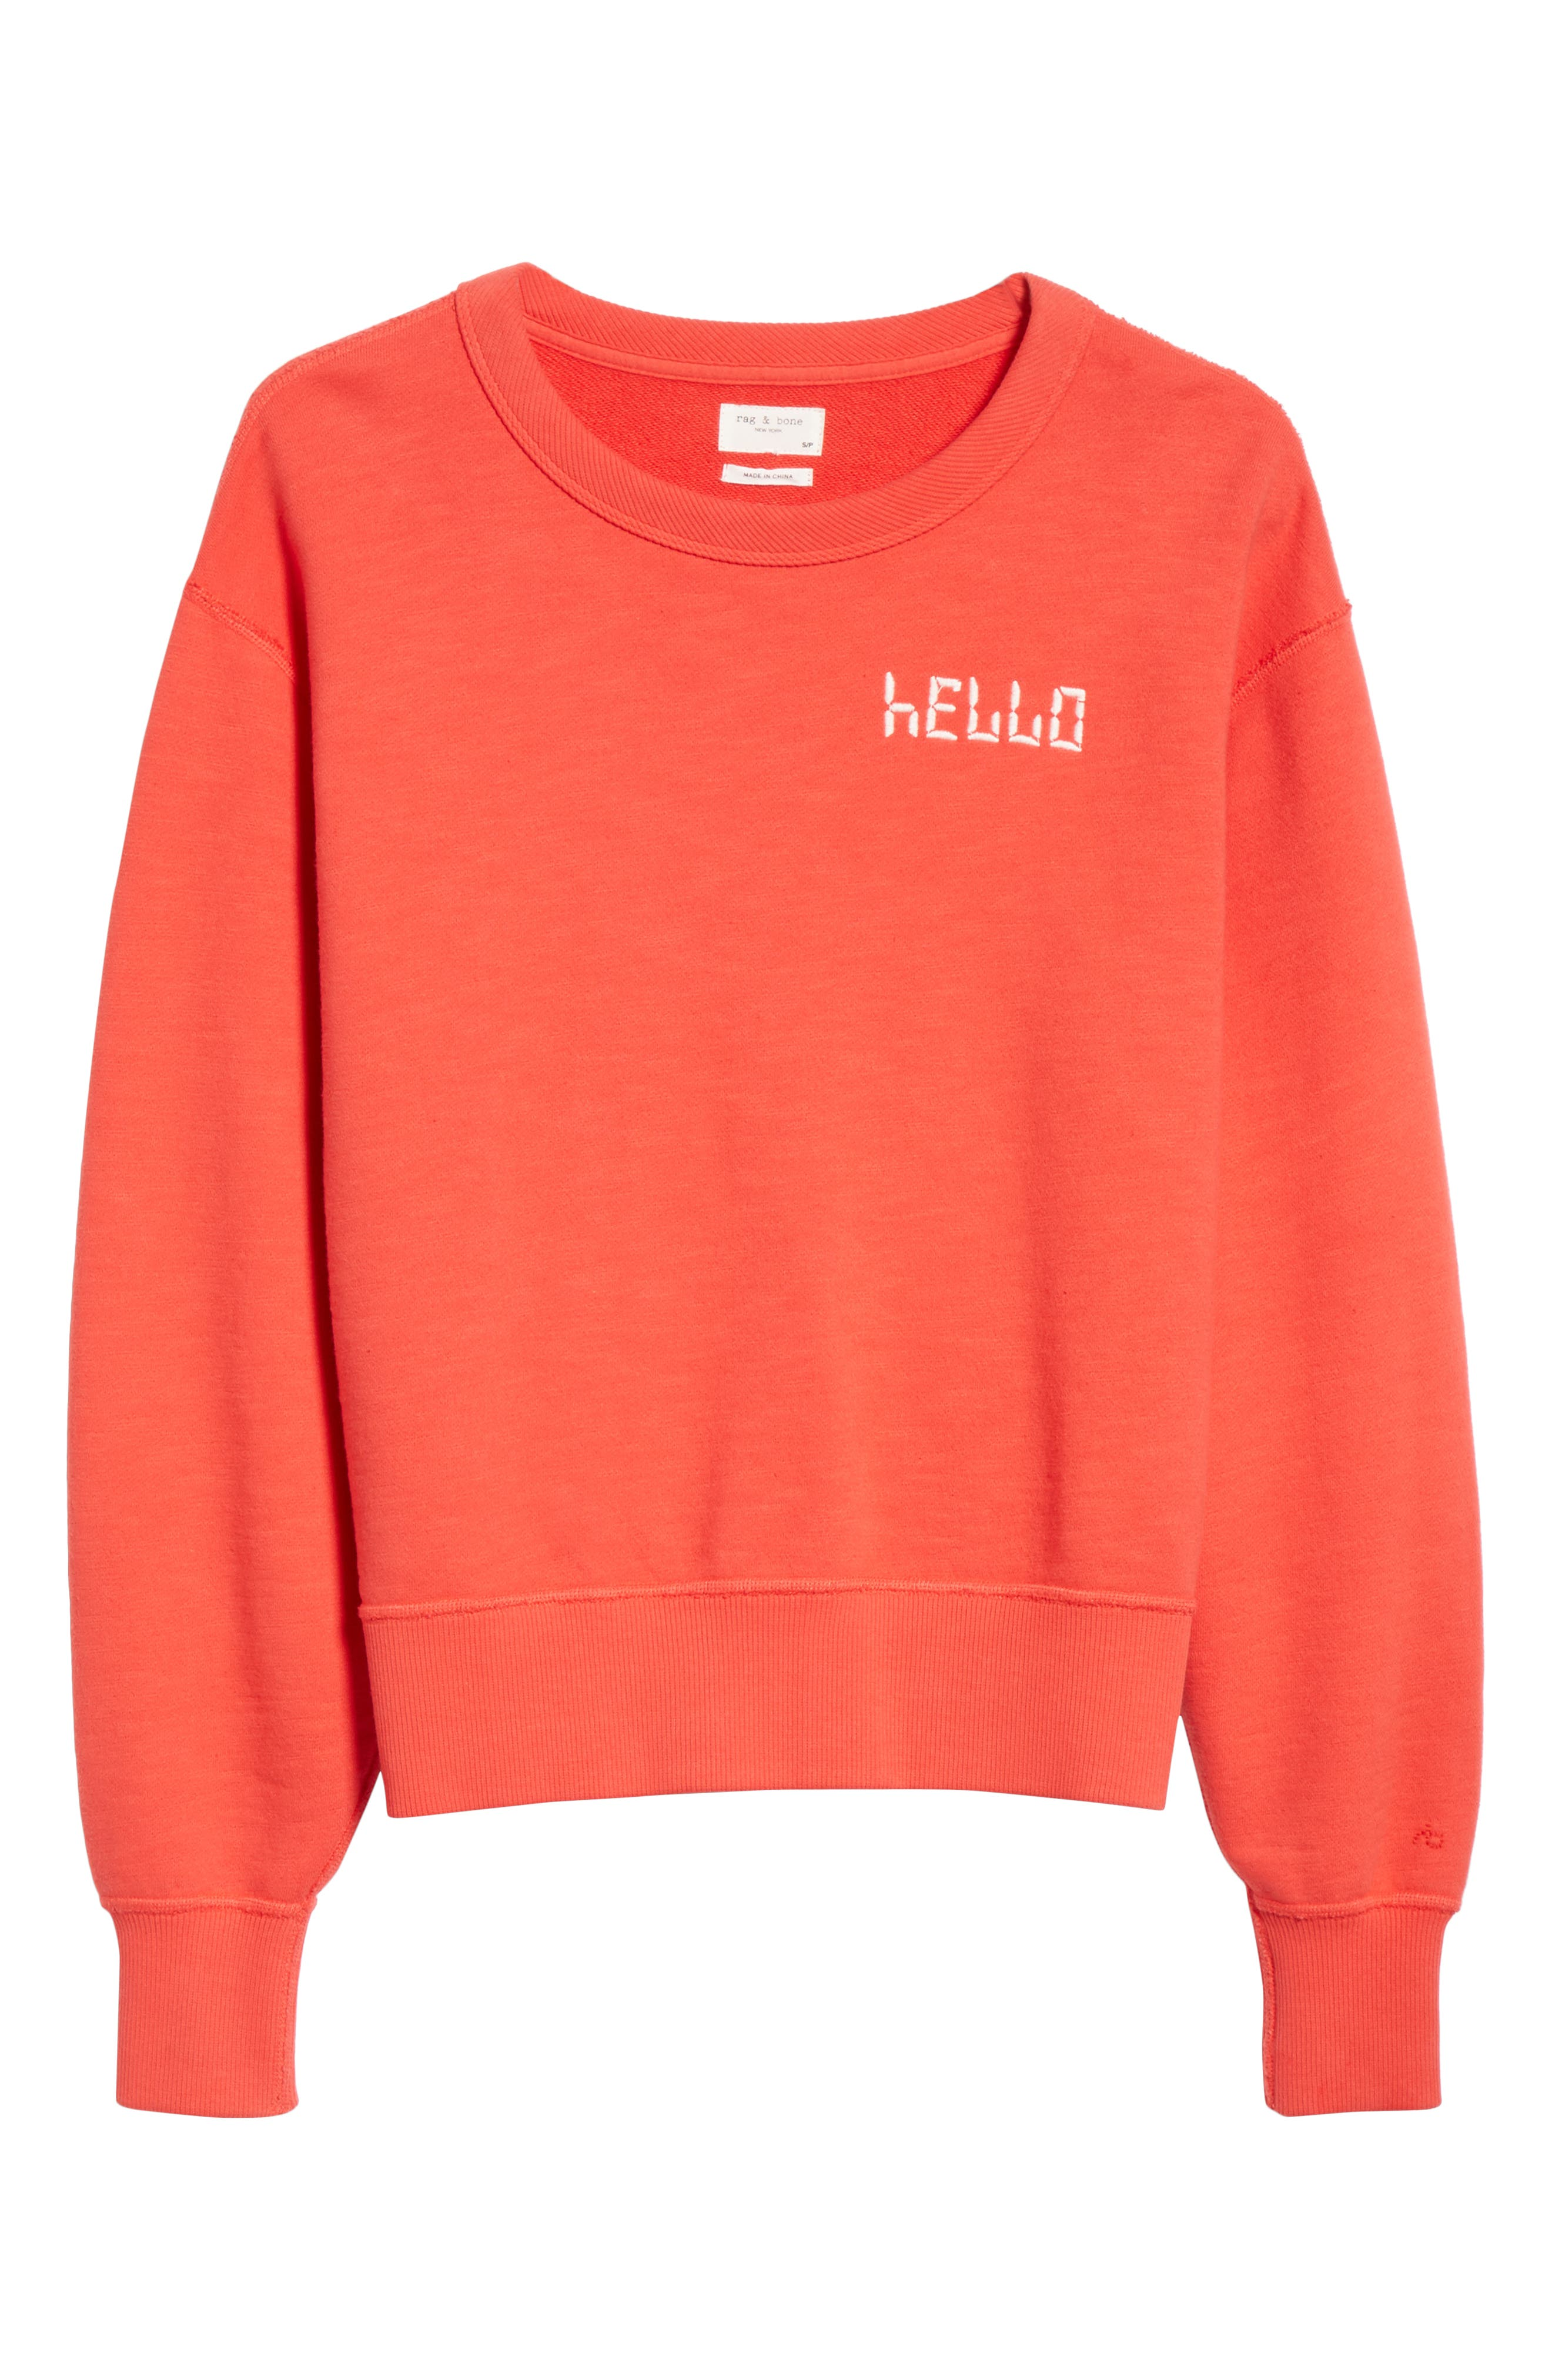 Hello Sweatshirt,                             Alternate thumbnail 6, color,                             CANDY APPLE